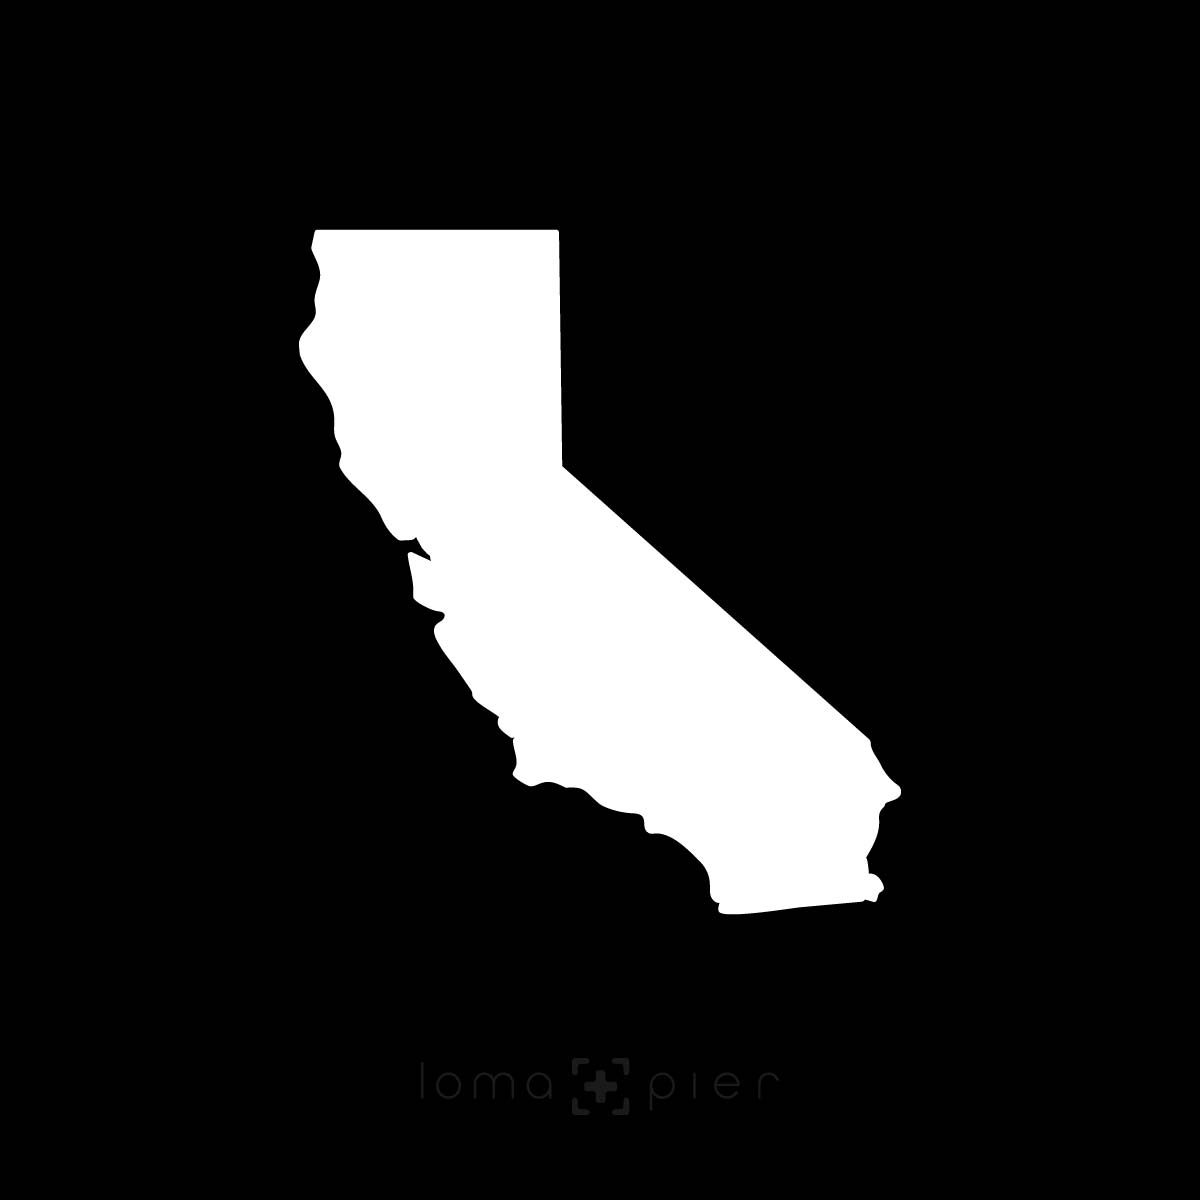 CALIFORNIA silhouette icon in the loma+pier hat store